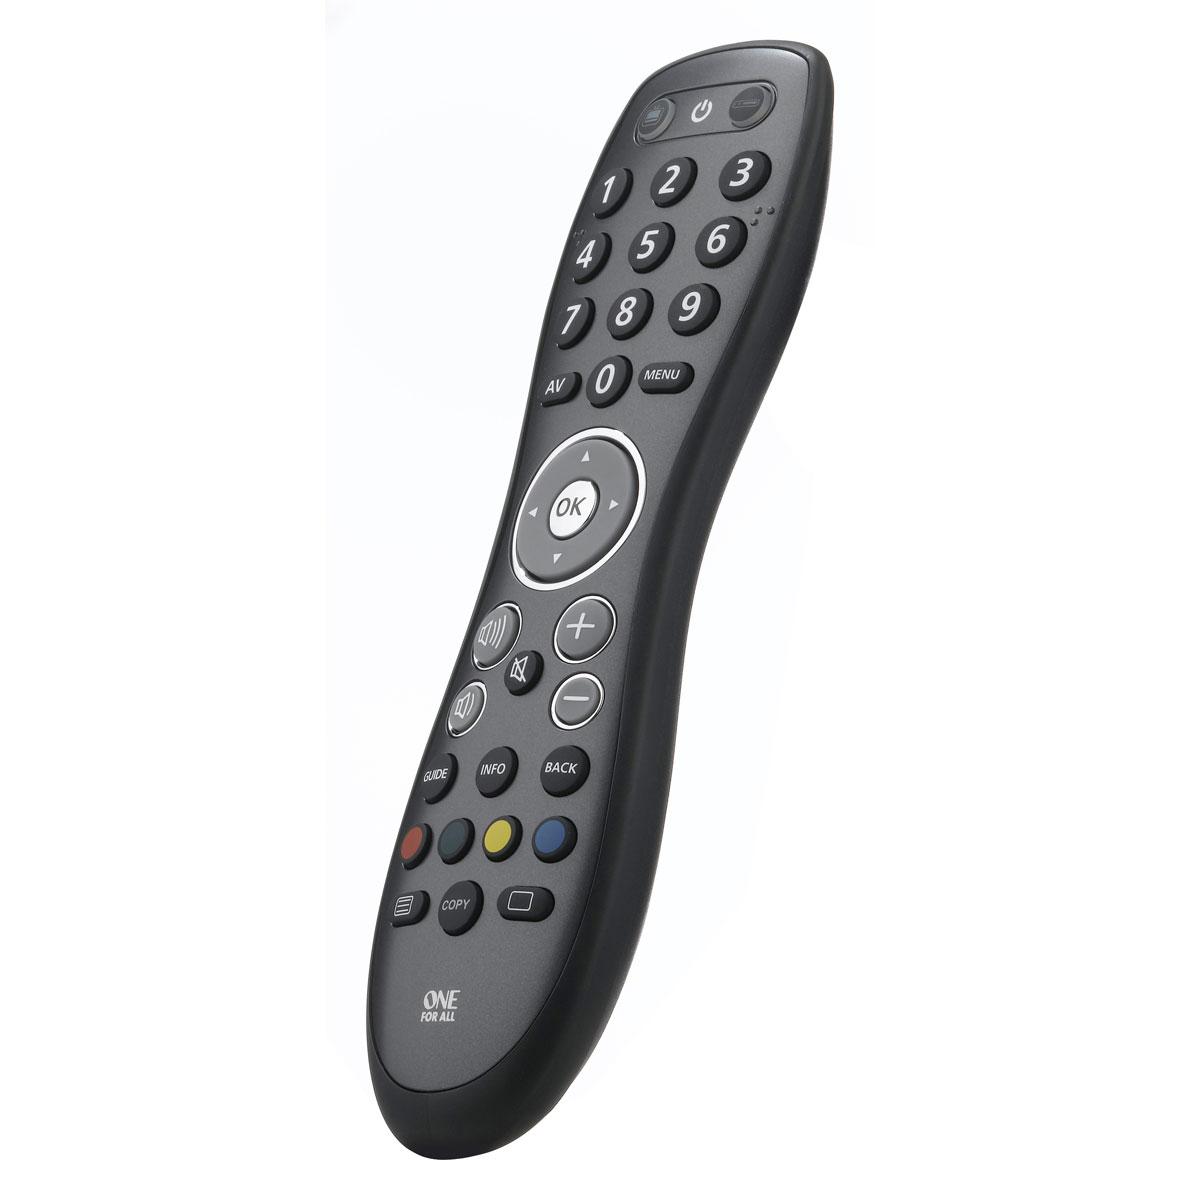 Télécommande One For All Easy & Robust 2-in-1 Télécommande universelle 2 en 1